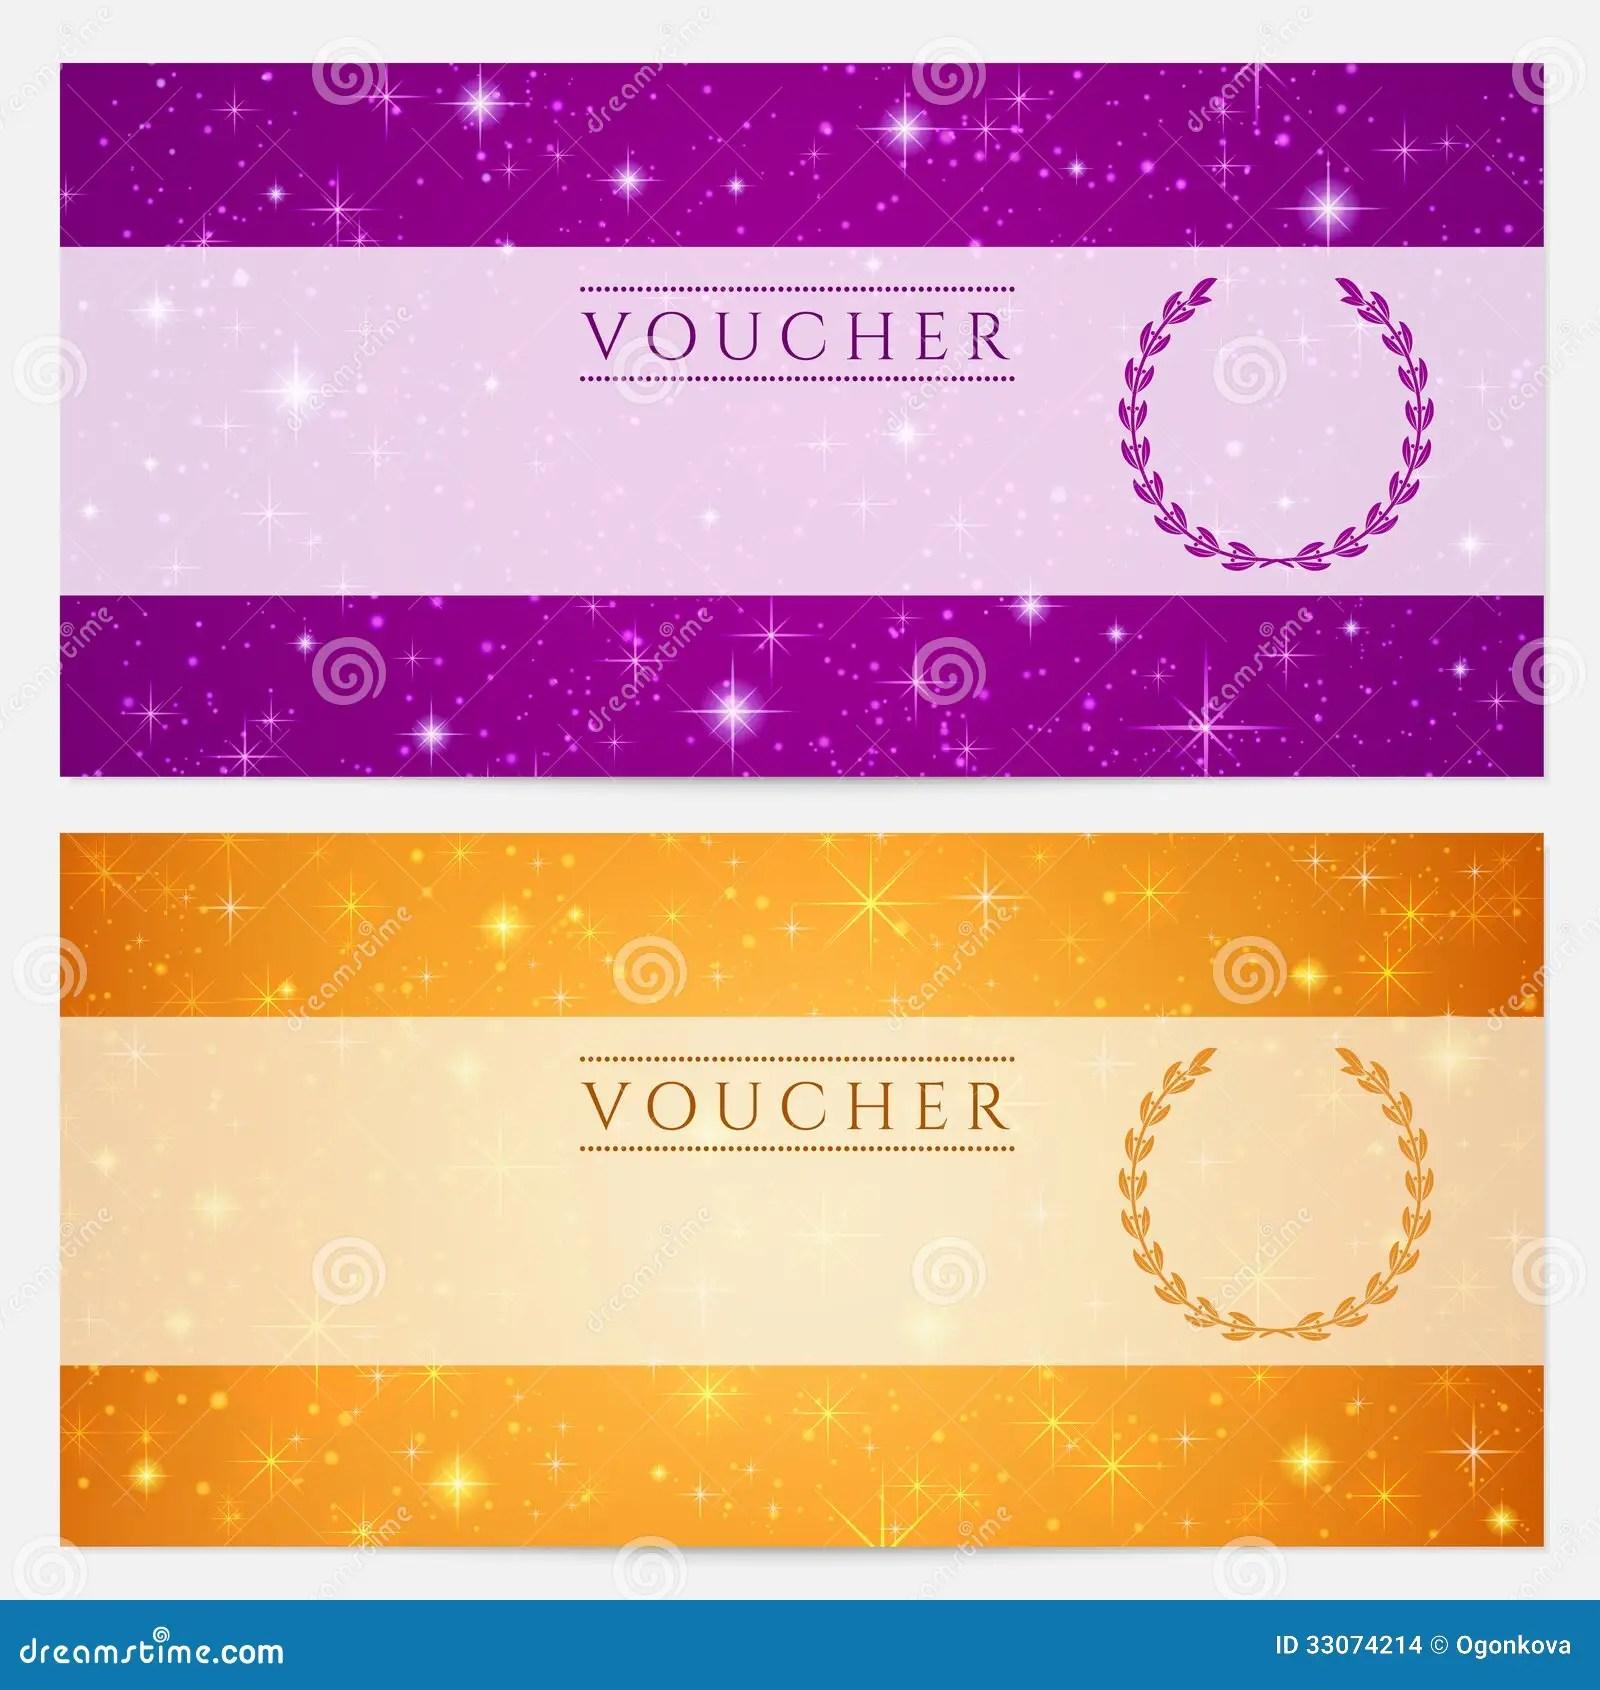 Free Voucher Template Downloads rent free letter template – Voucher Design Template Free